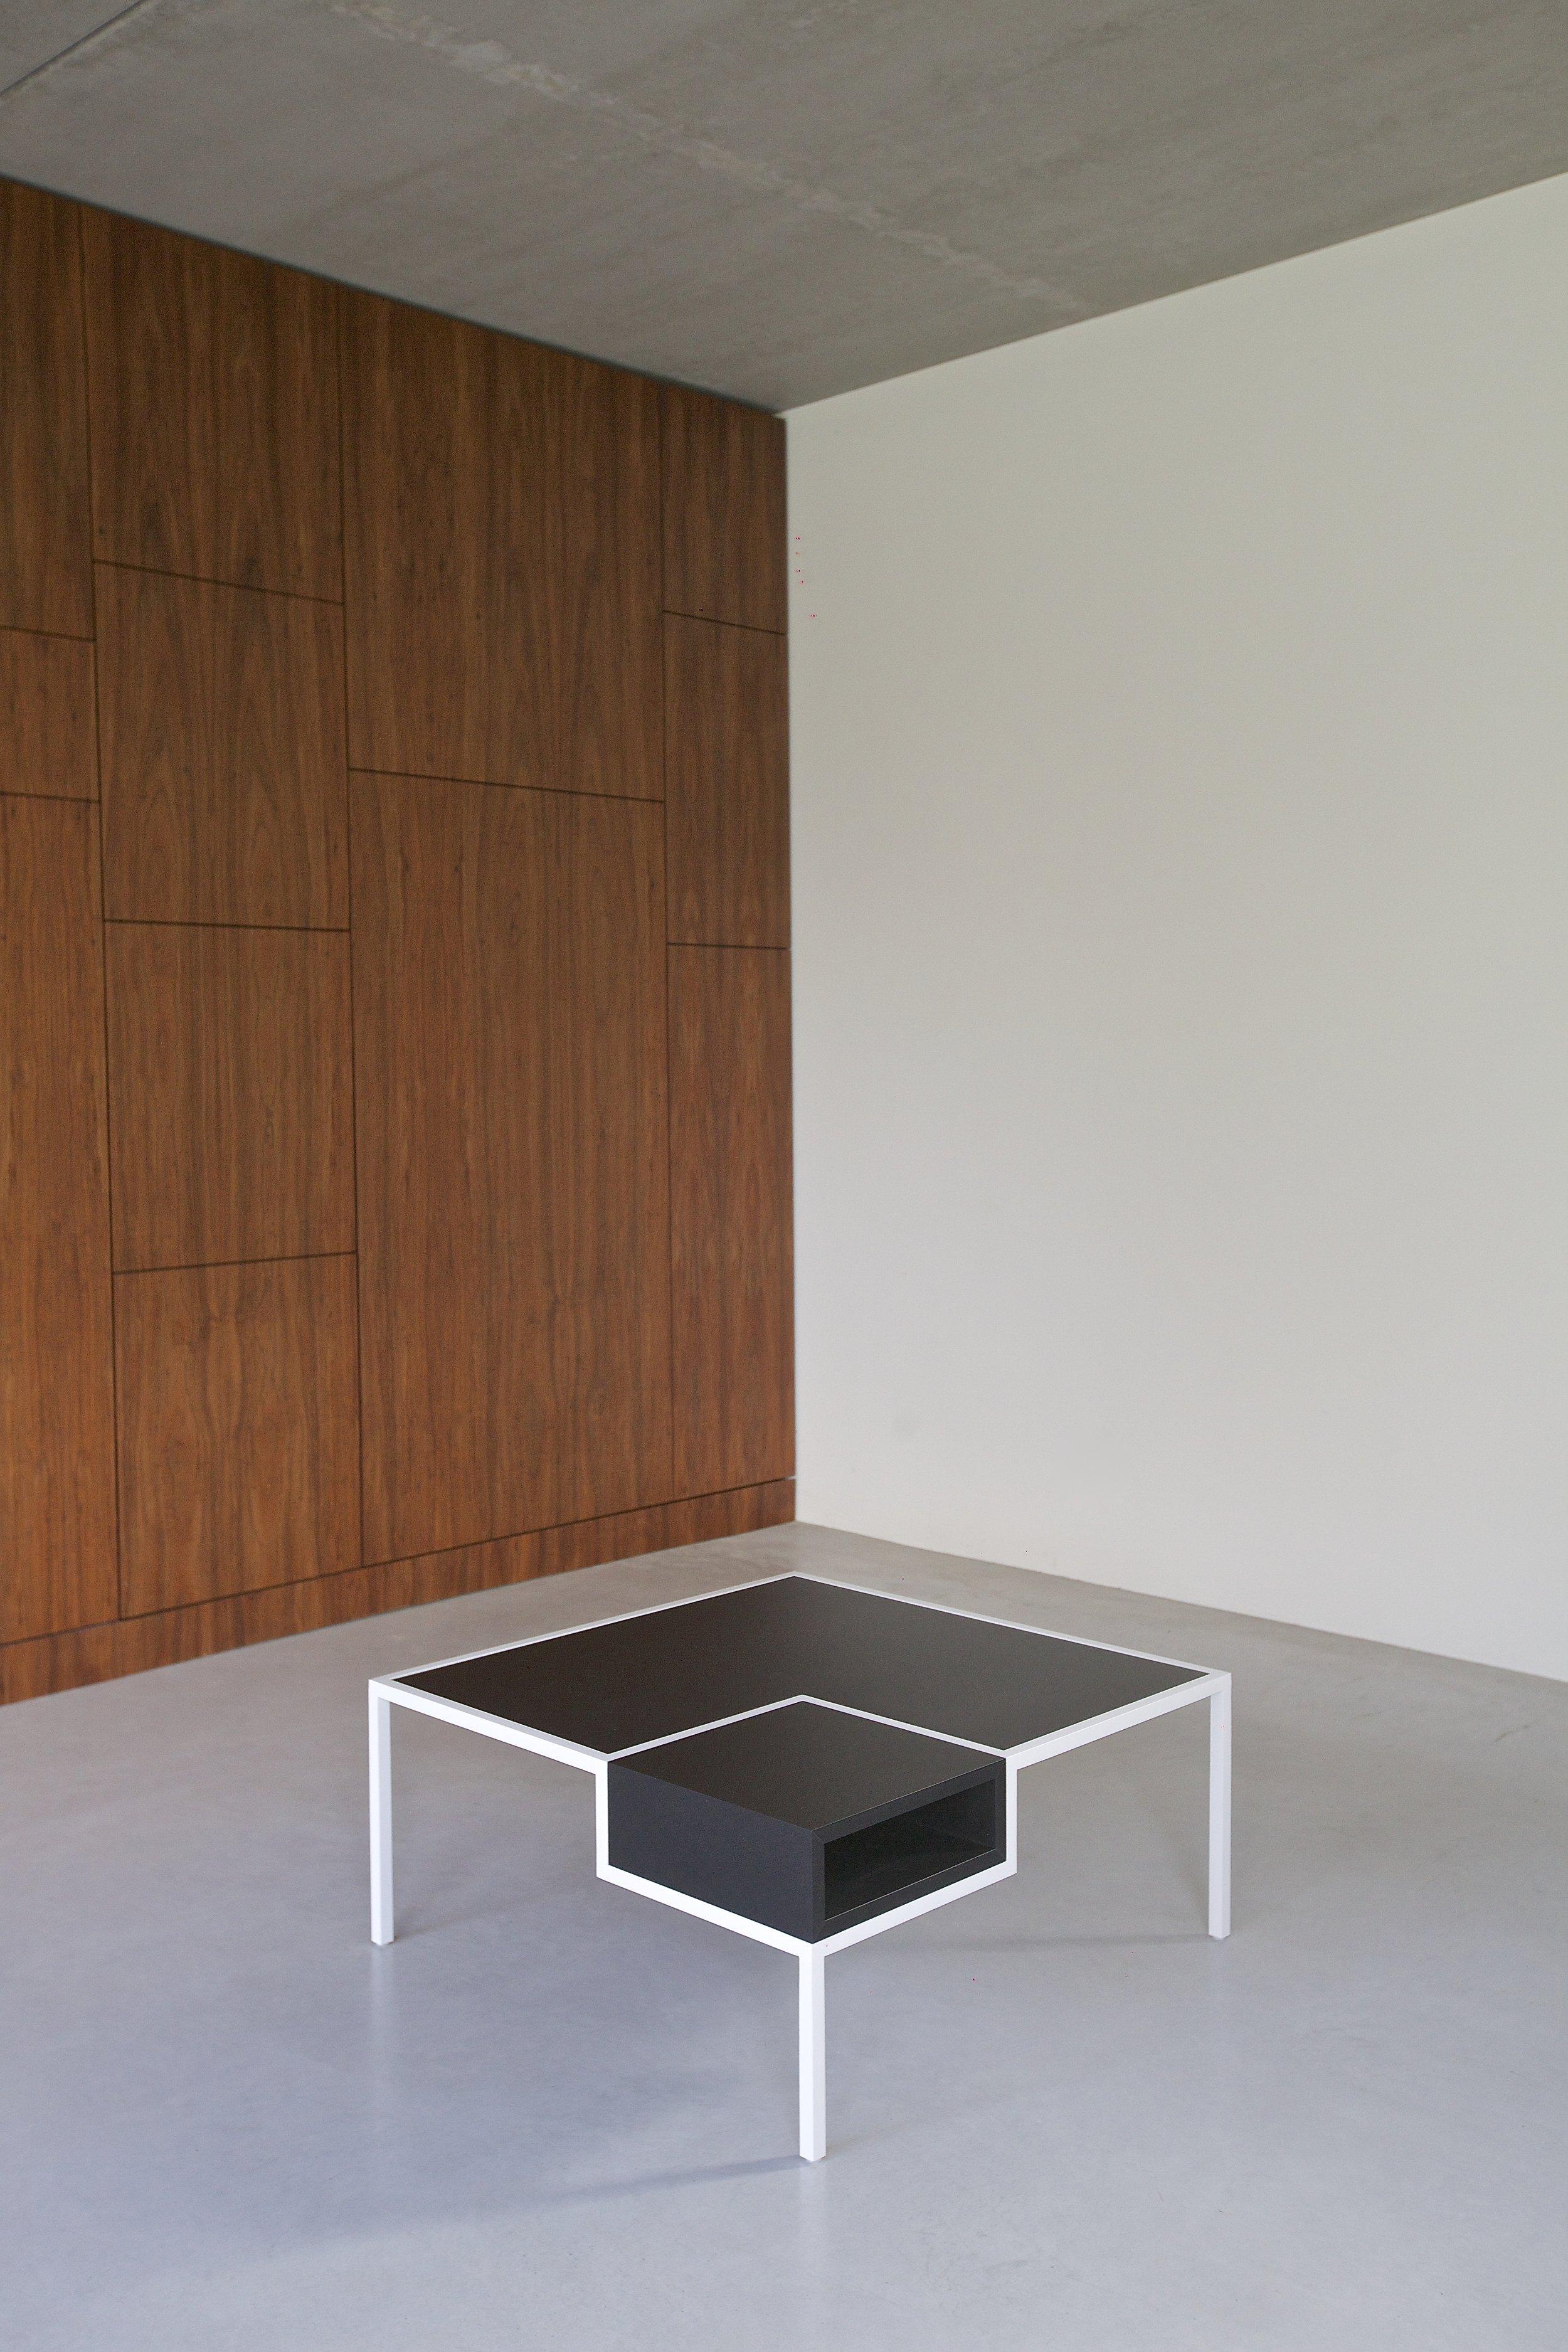 Filip Janssens LR Fusion table.jpg